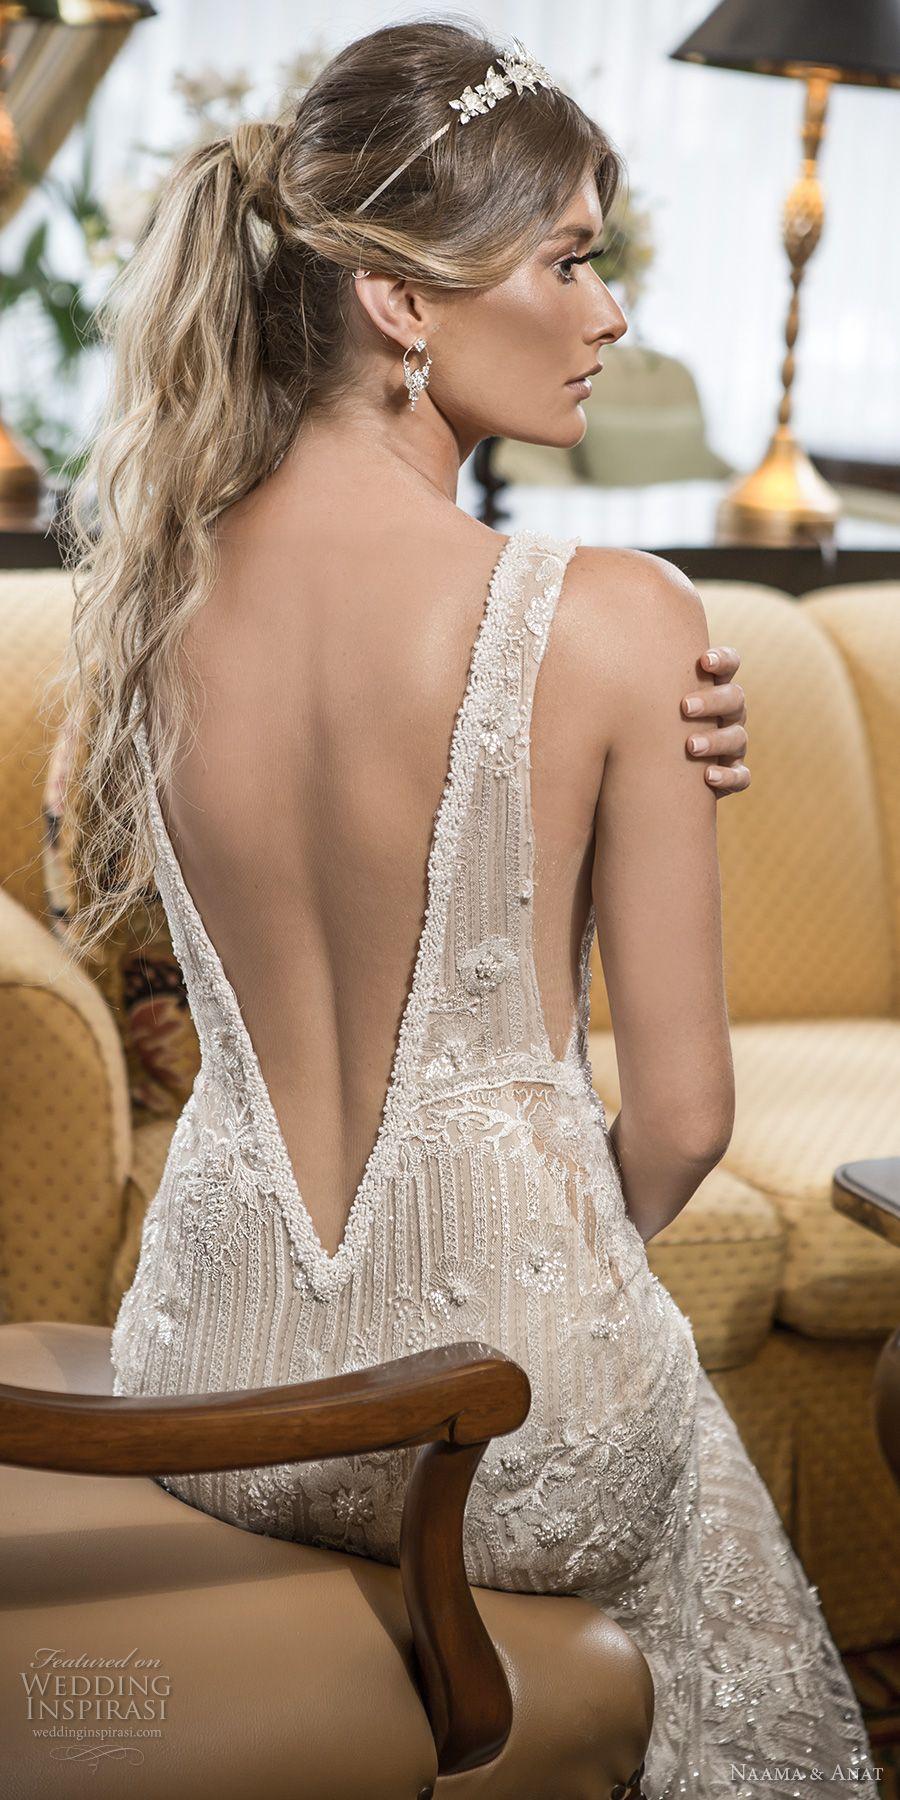 Undergarments for open back wedding dress  Naama u Anat  Wedding Dresses u ucThe Star in Youud Bridal